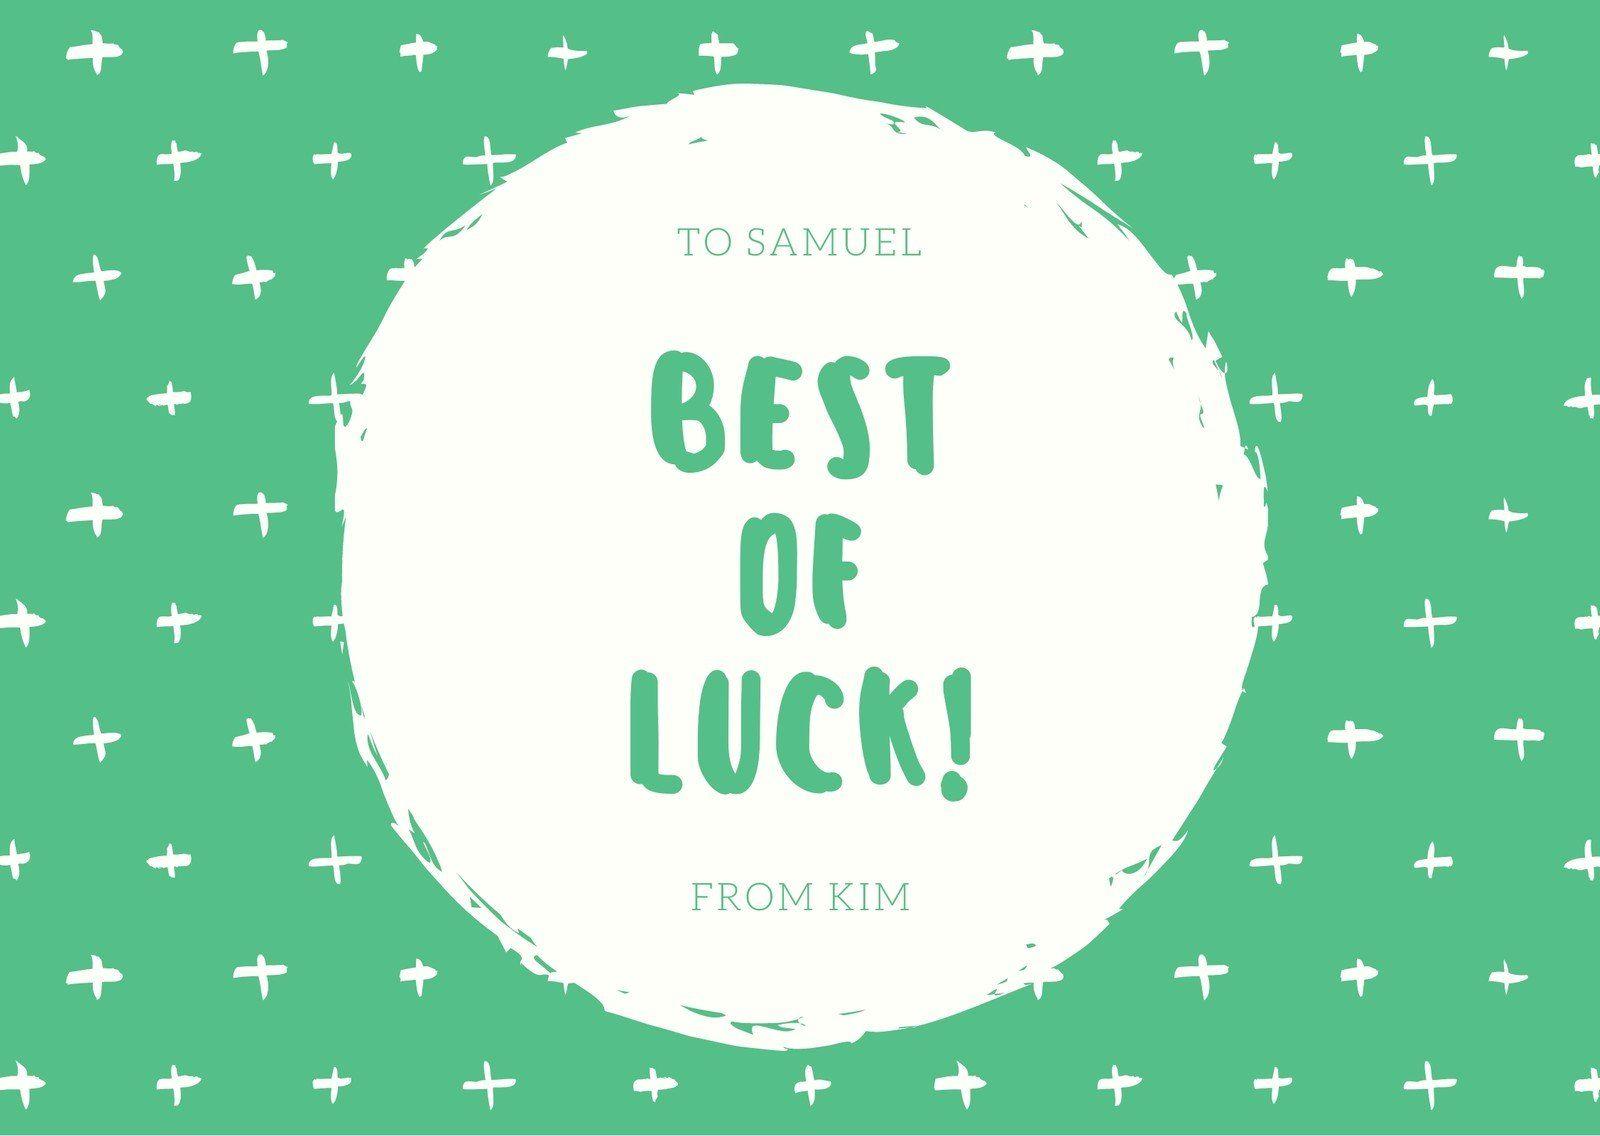 Green And Cream Goodluck Card Templatescanva Regarding Good Luck Card Templates Business Professional Te Good Luck Cards Goodbye And Good Luck New Job Card